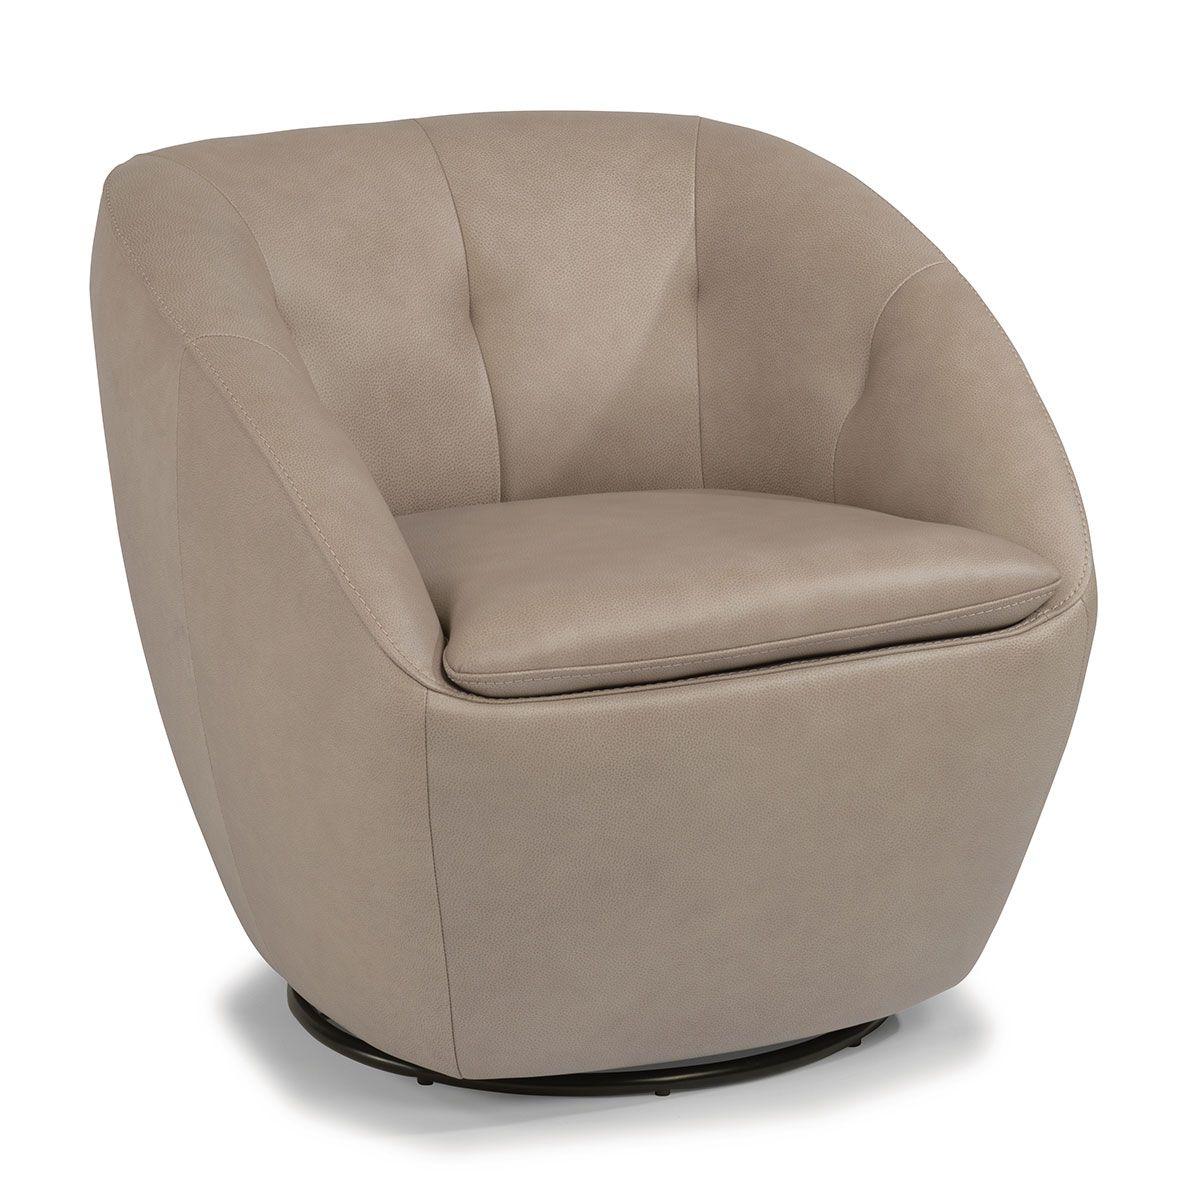 Flexsteel Wade Pebble Leather Swivel Chair